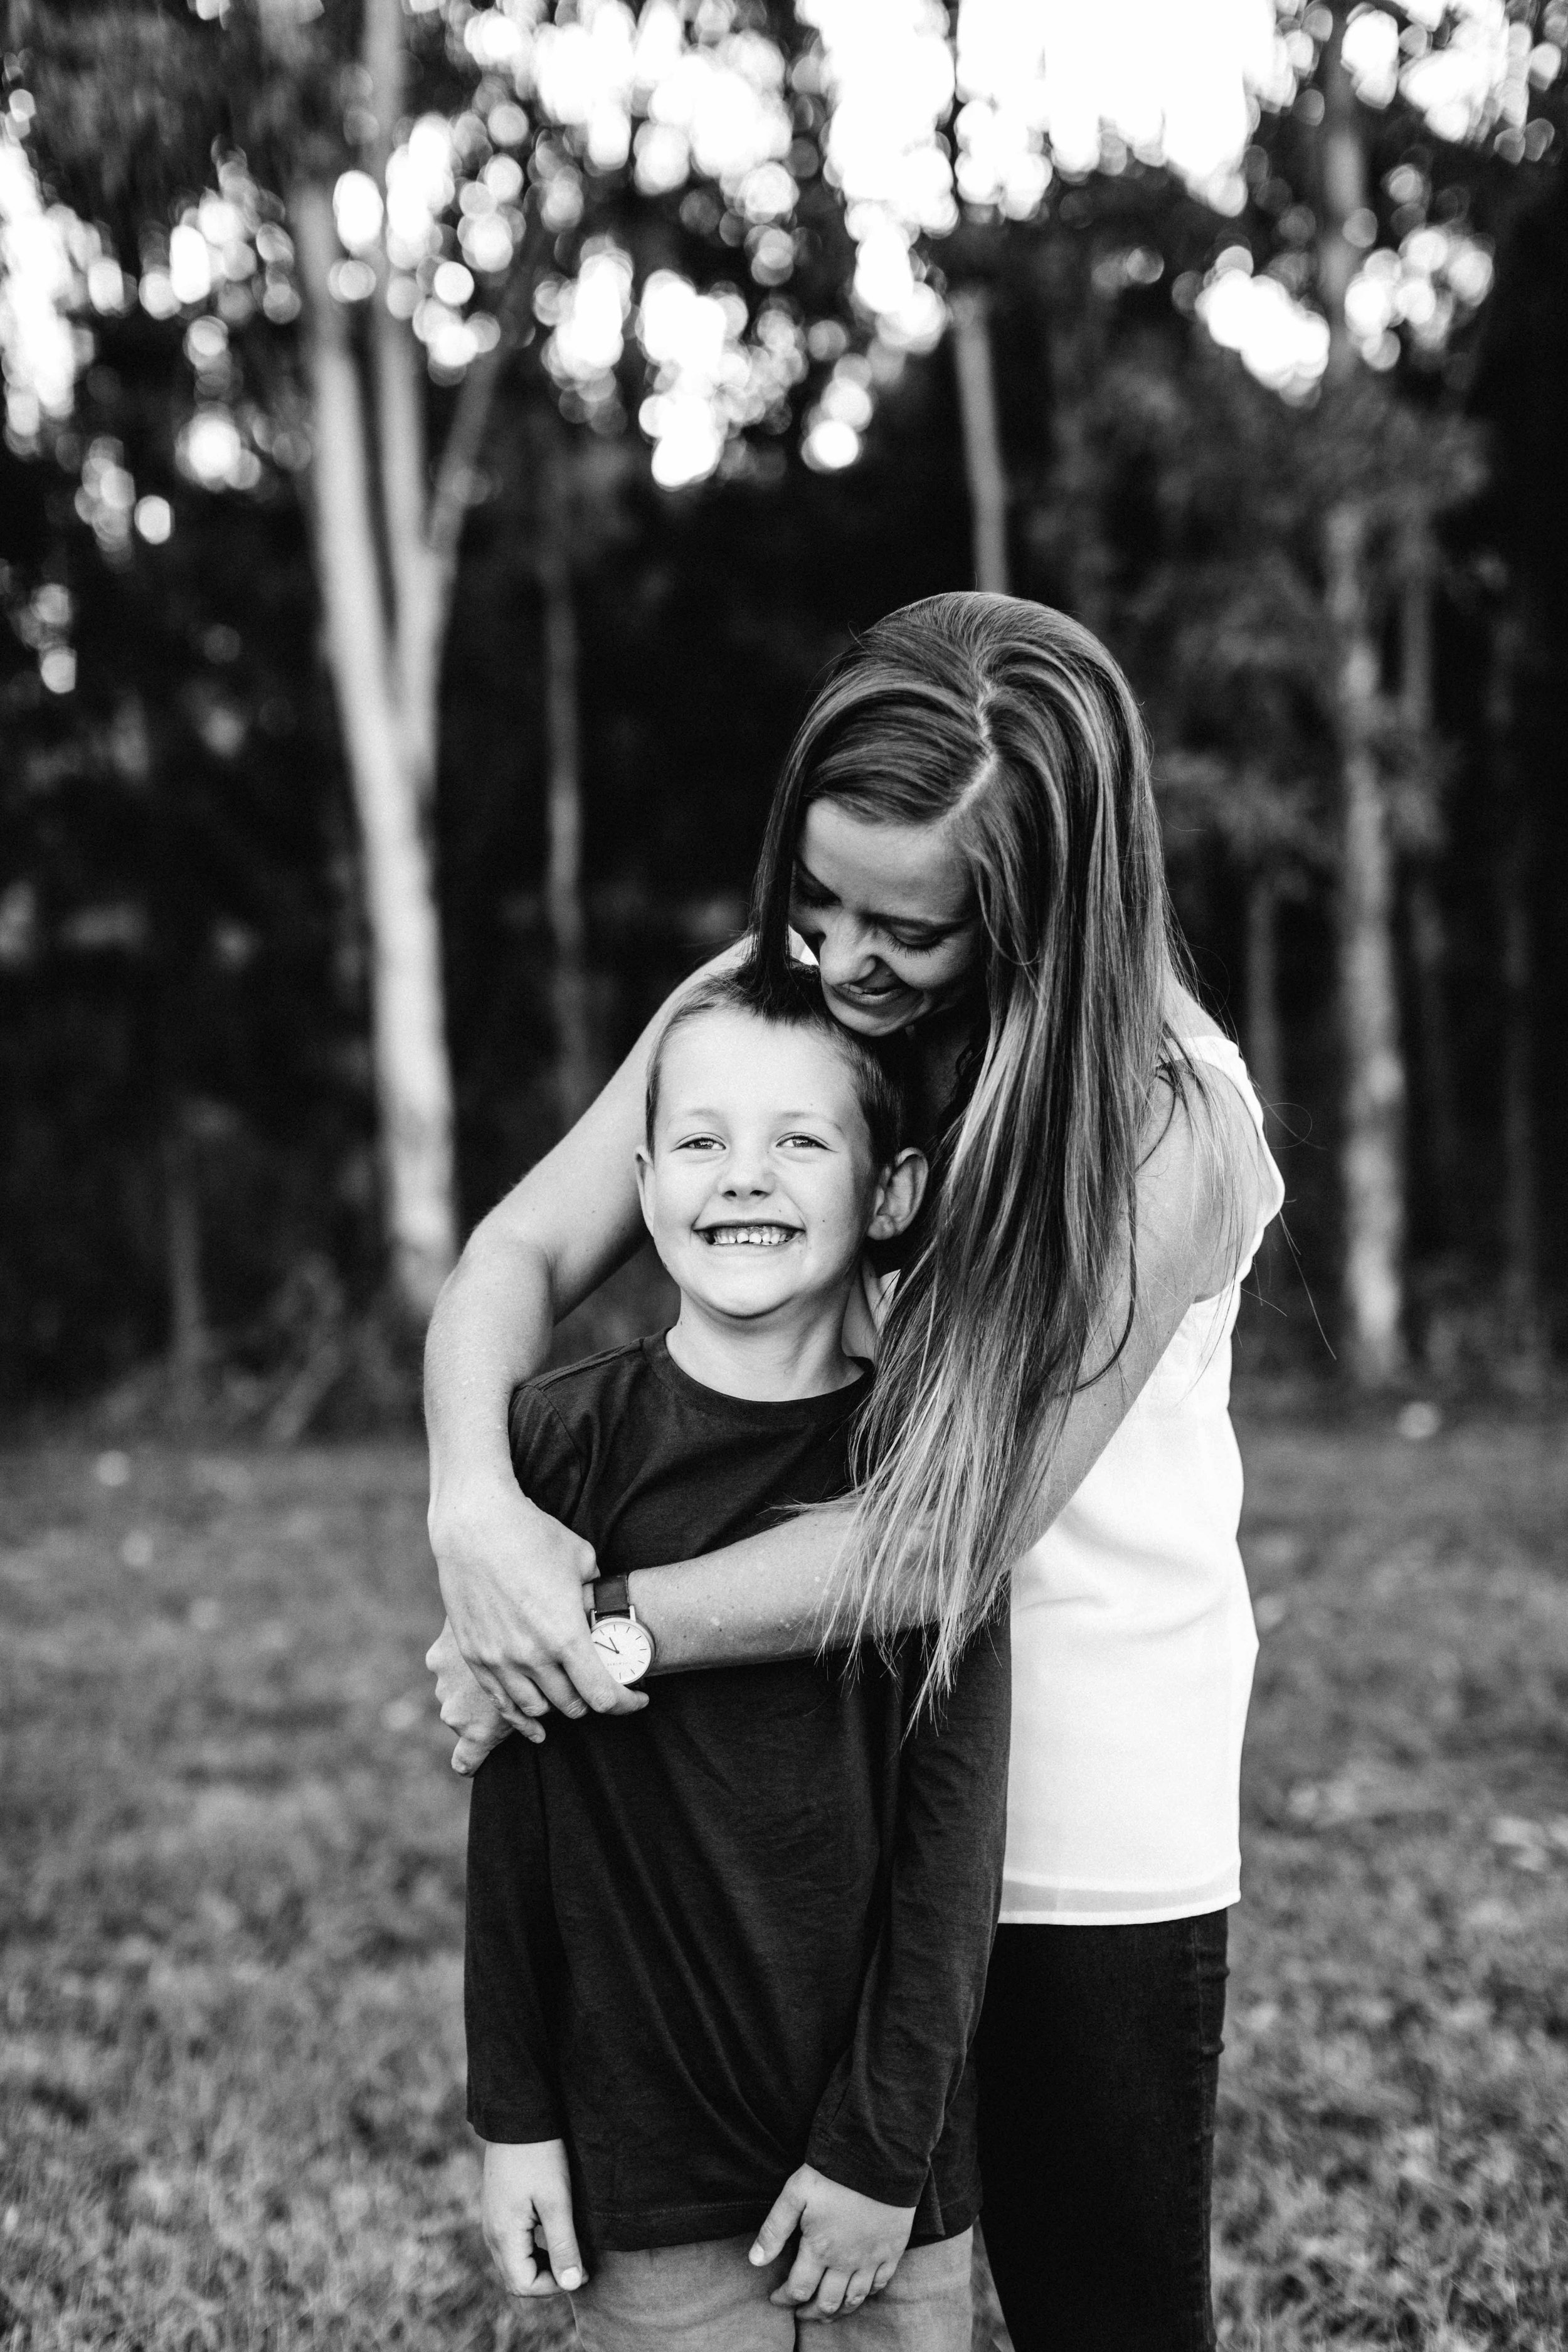 camden-family-photography-boot-family-session-23.jpg